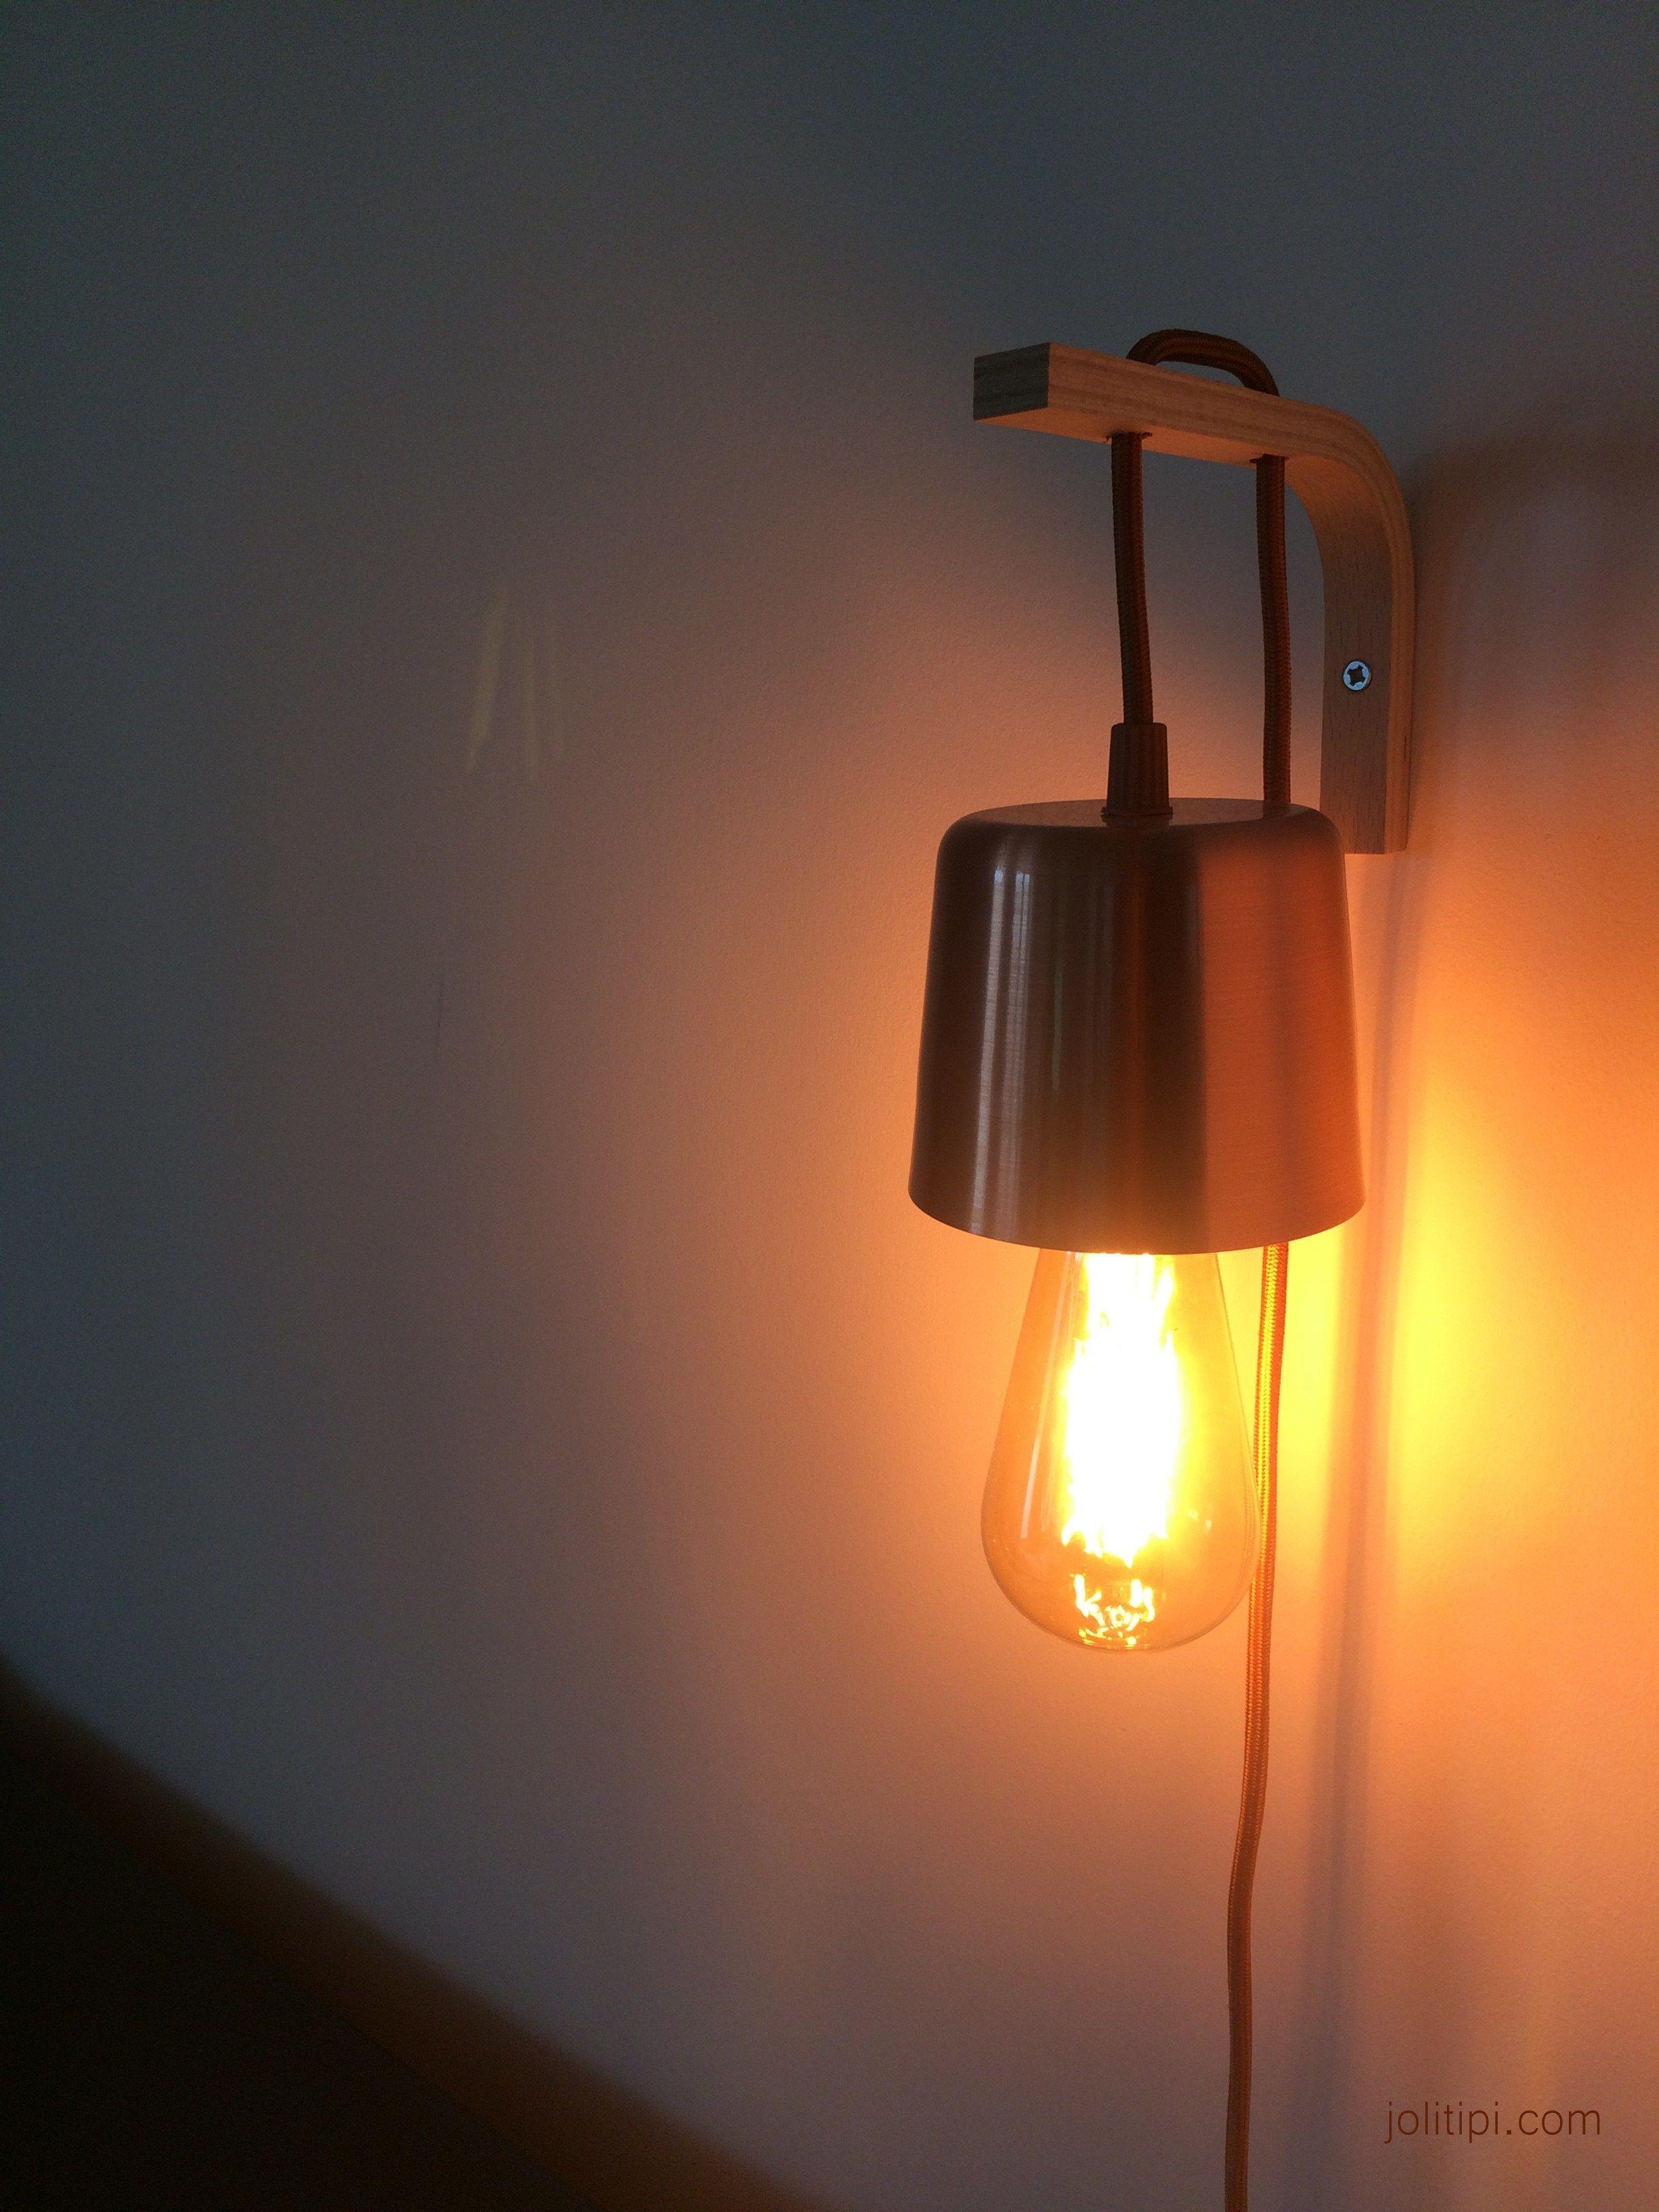 Transformer Une Suspension Lumineuse En Baladeuse Murale Mon Ikea Hack Luminaire Ikea Applique Ikea Parement Mural